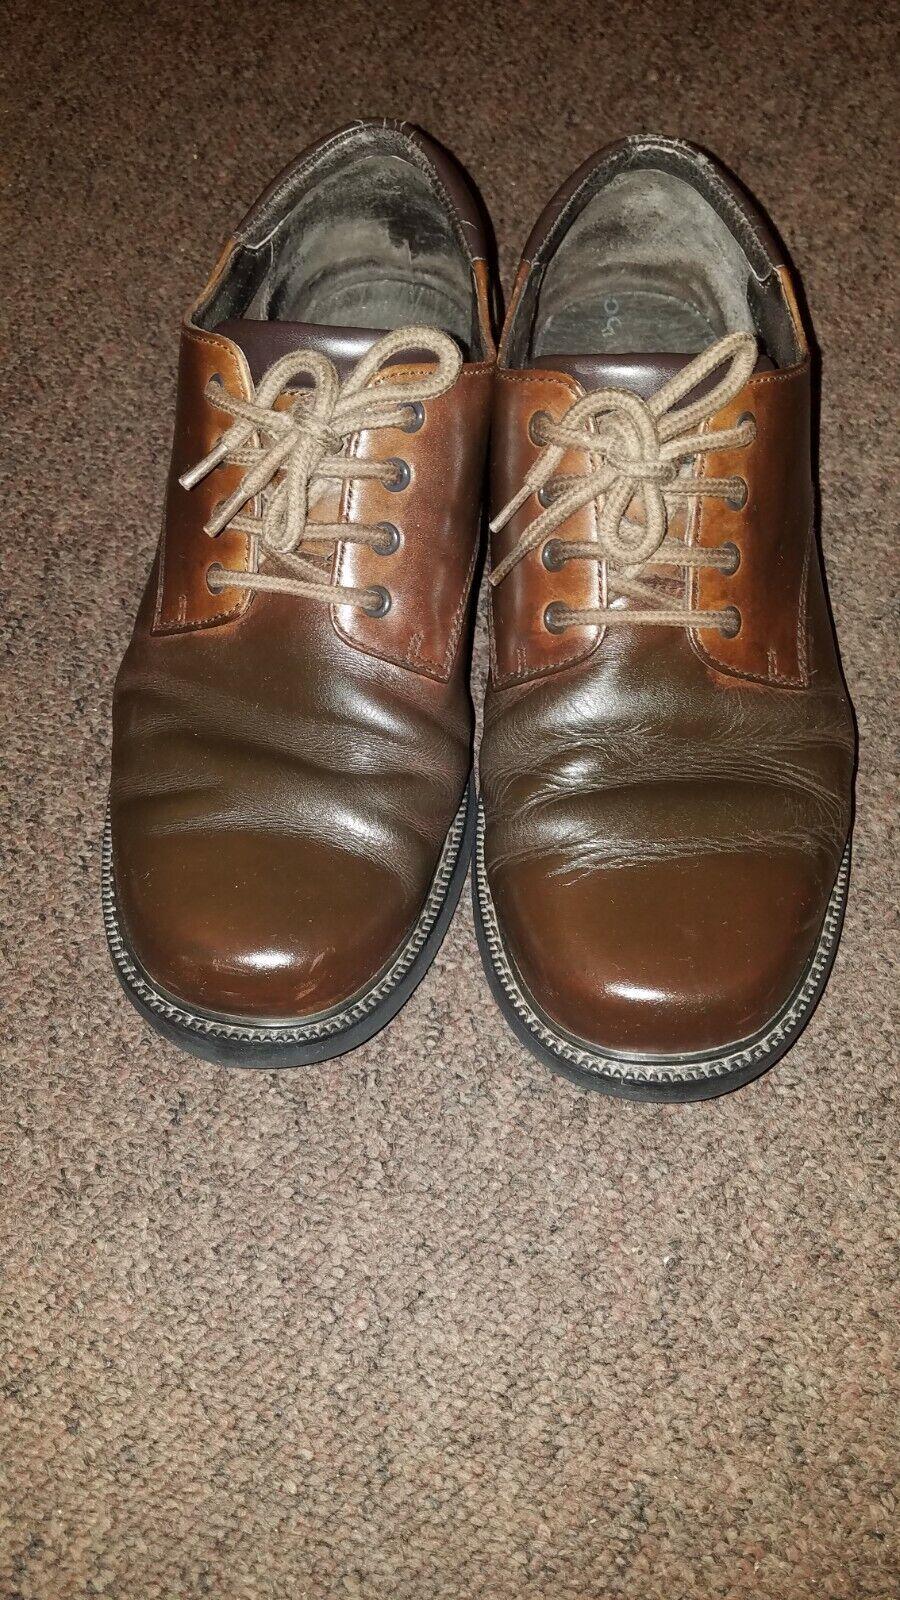 ROCKPORT Shoes Size UK 9 Wide BROWN Leather Waterproof Hydro-Shield Men